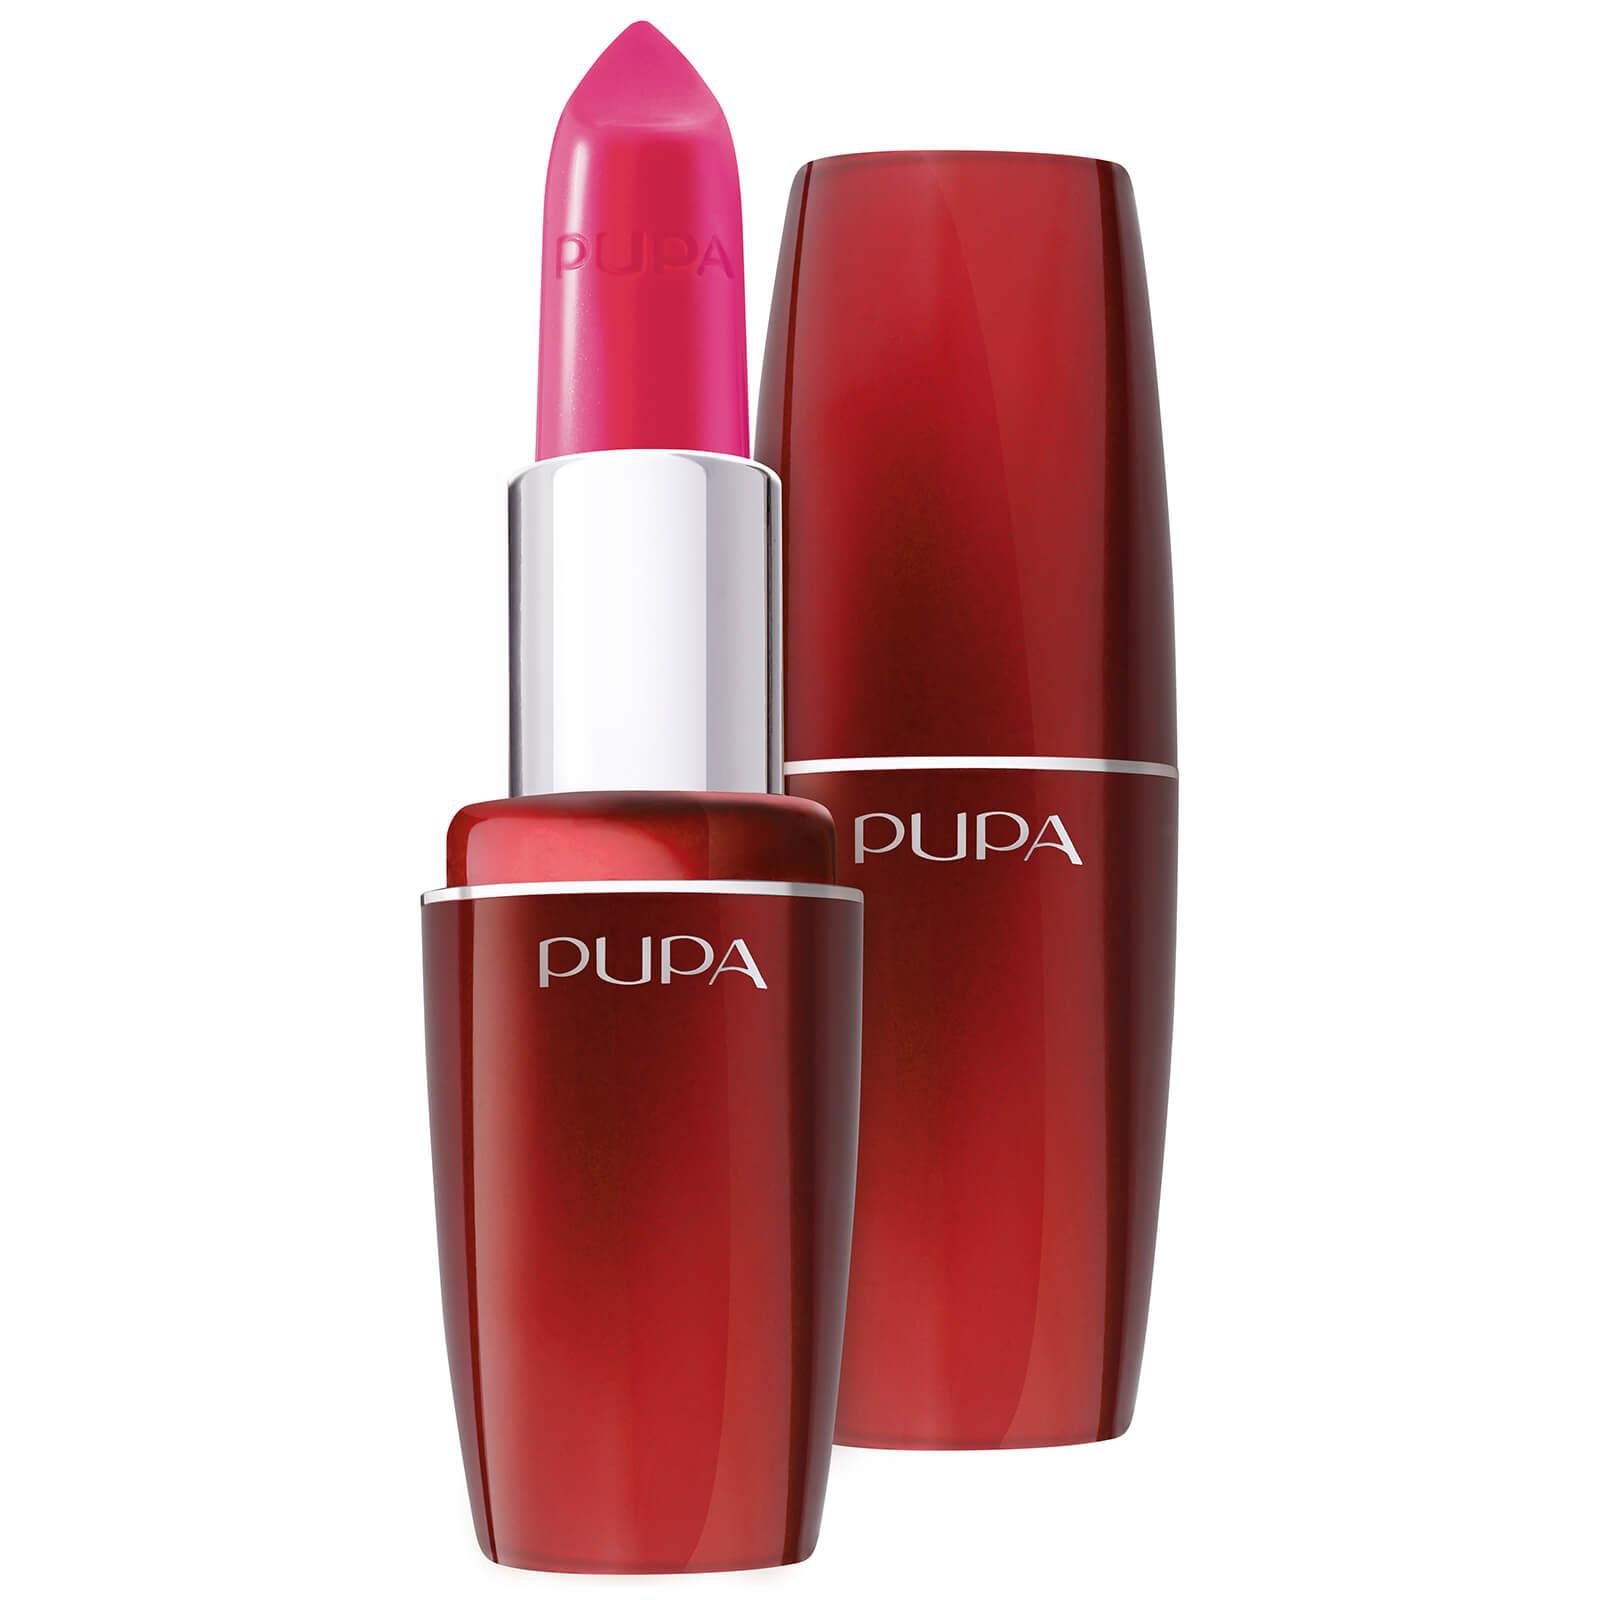 Купить PUPA Volume Enhancing Lipstick (Various Shades) - Pop Fuchsia